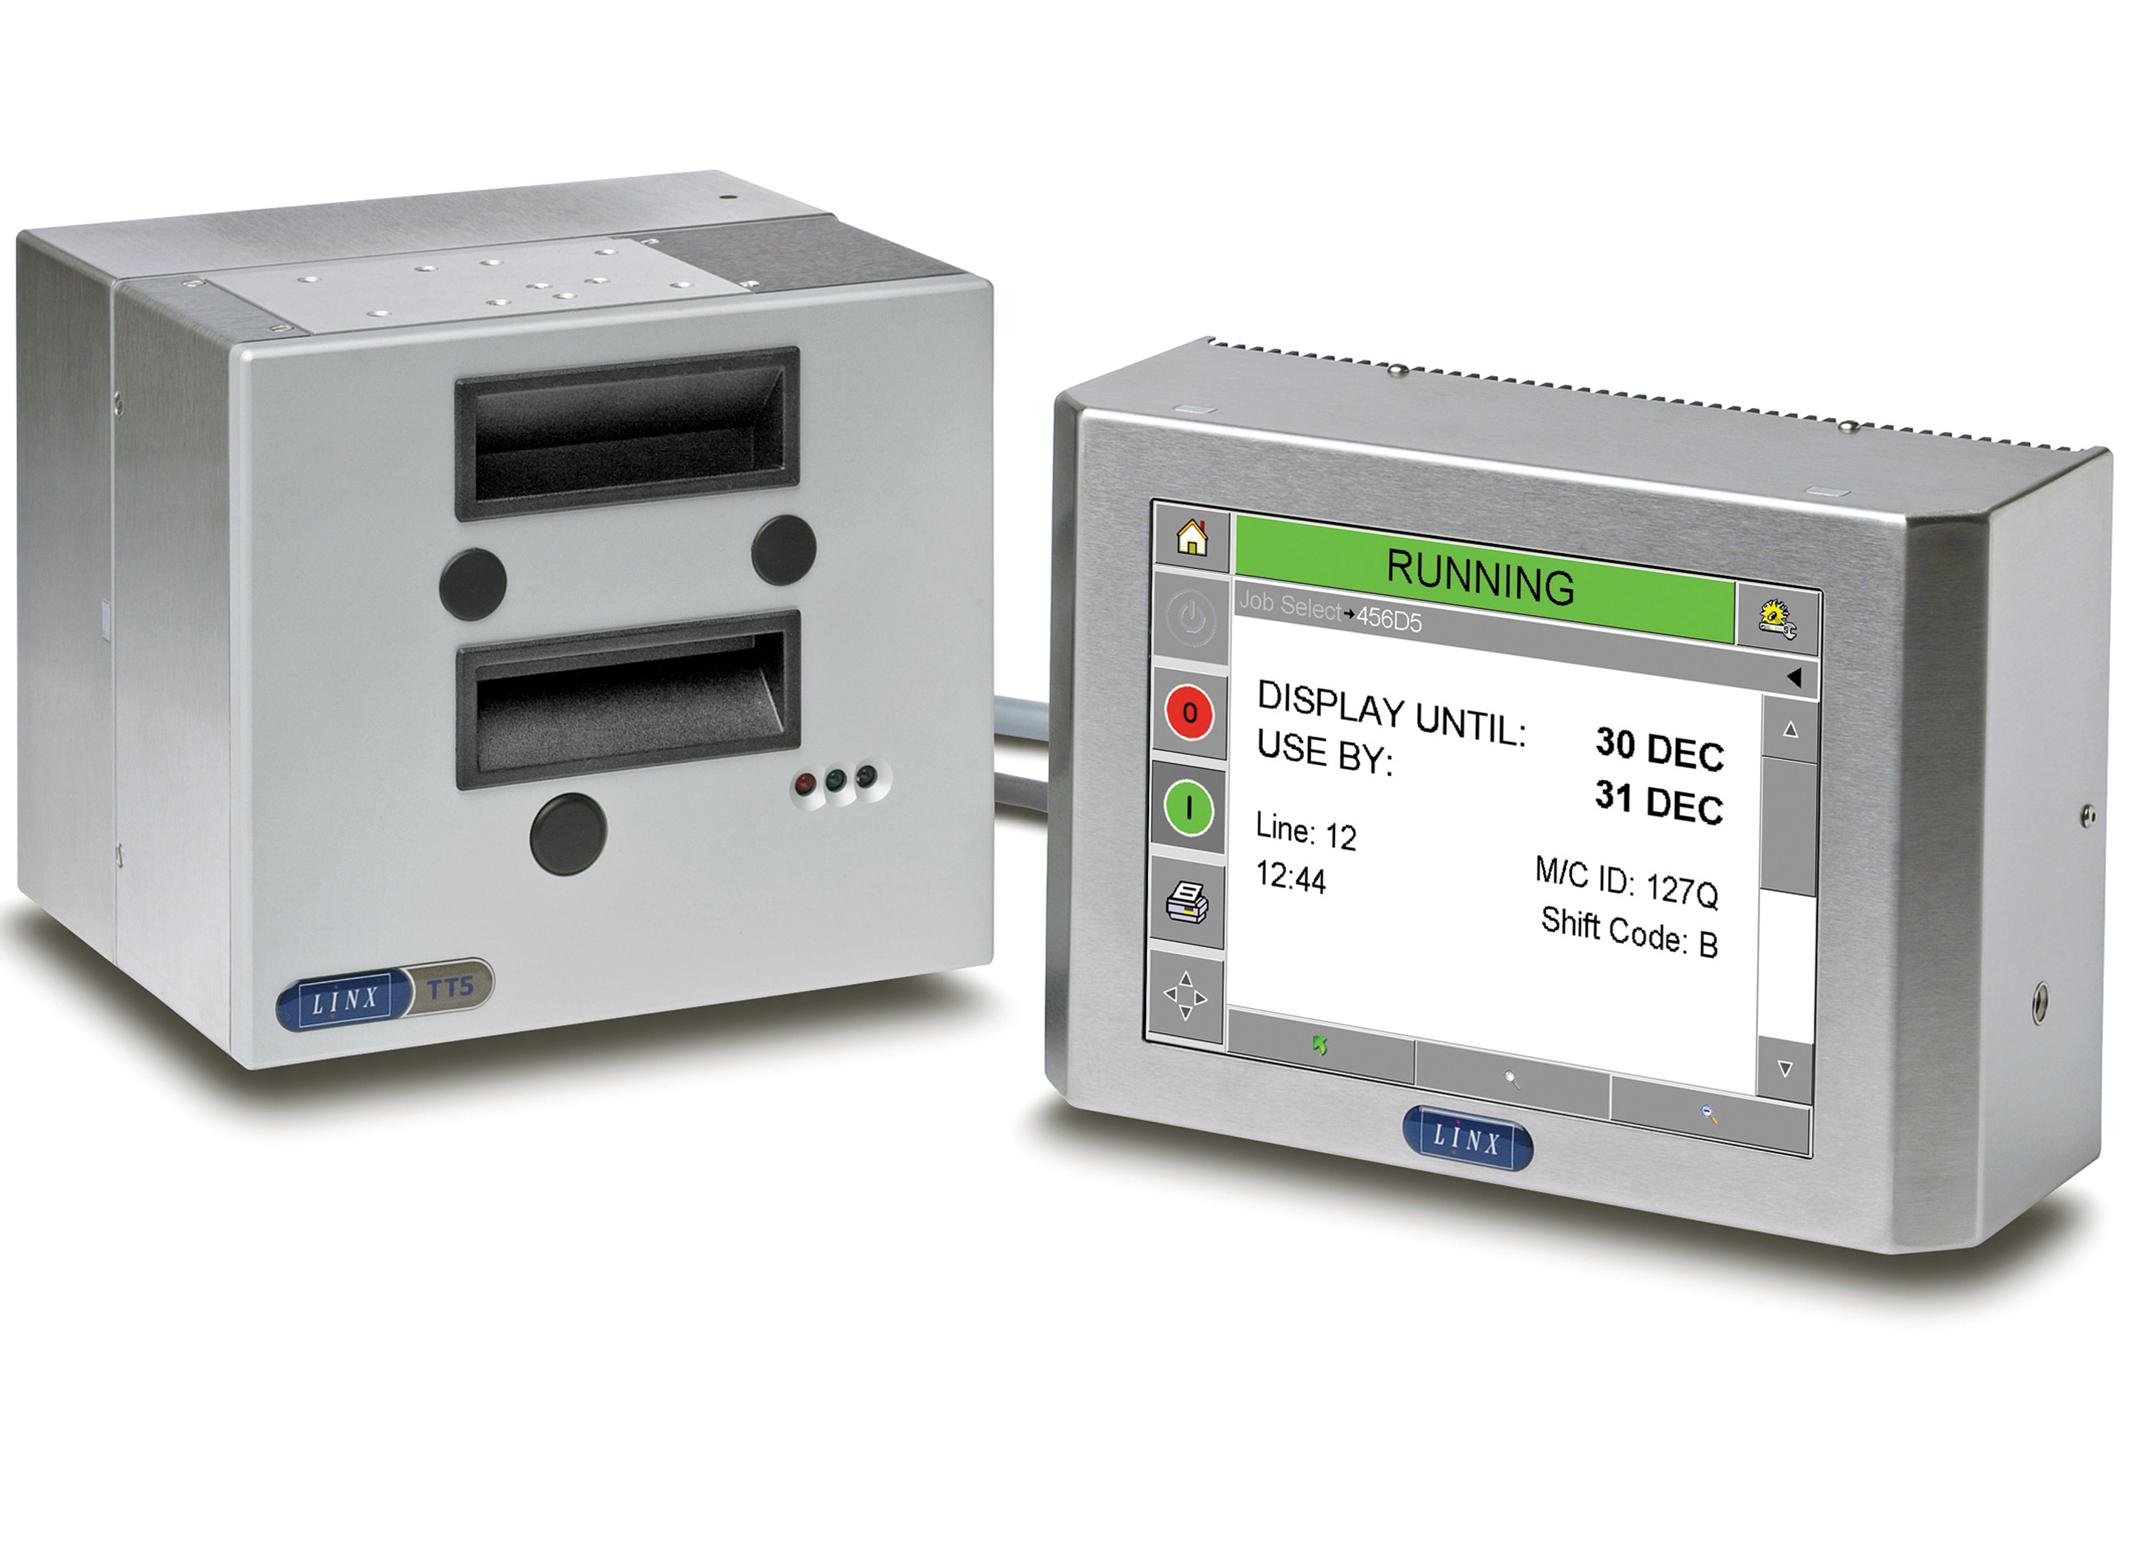 Printer thermal transfer: LINX TT10